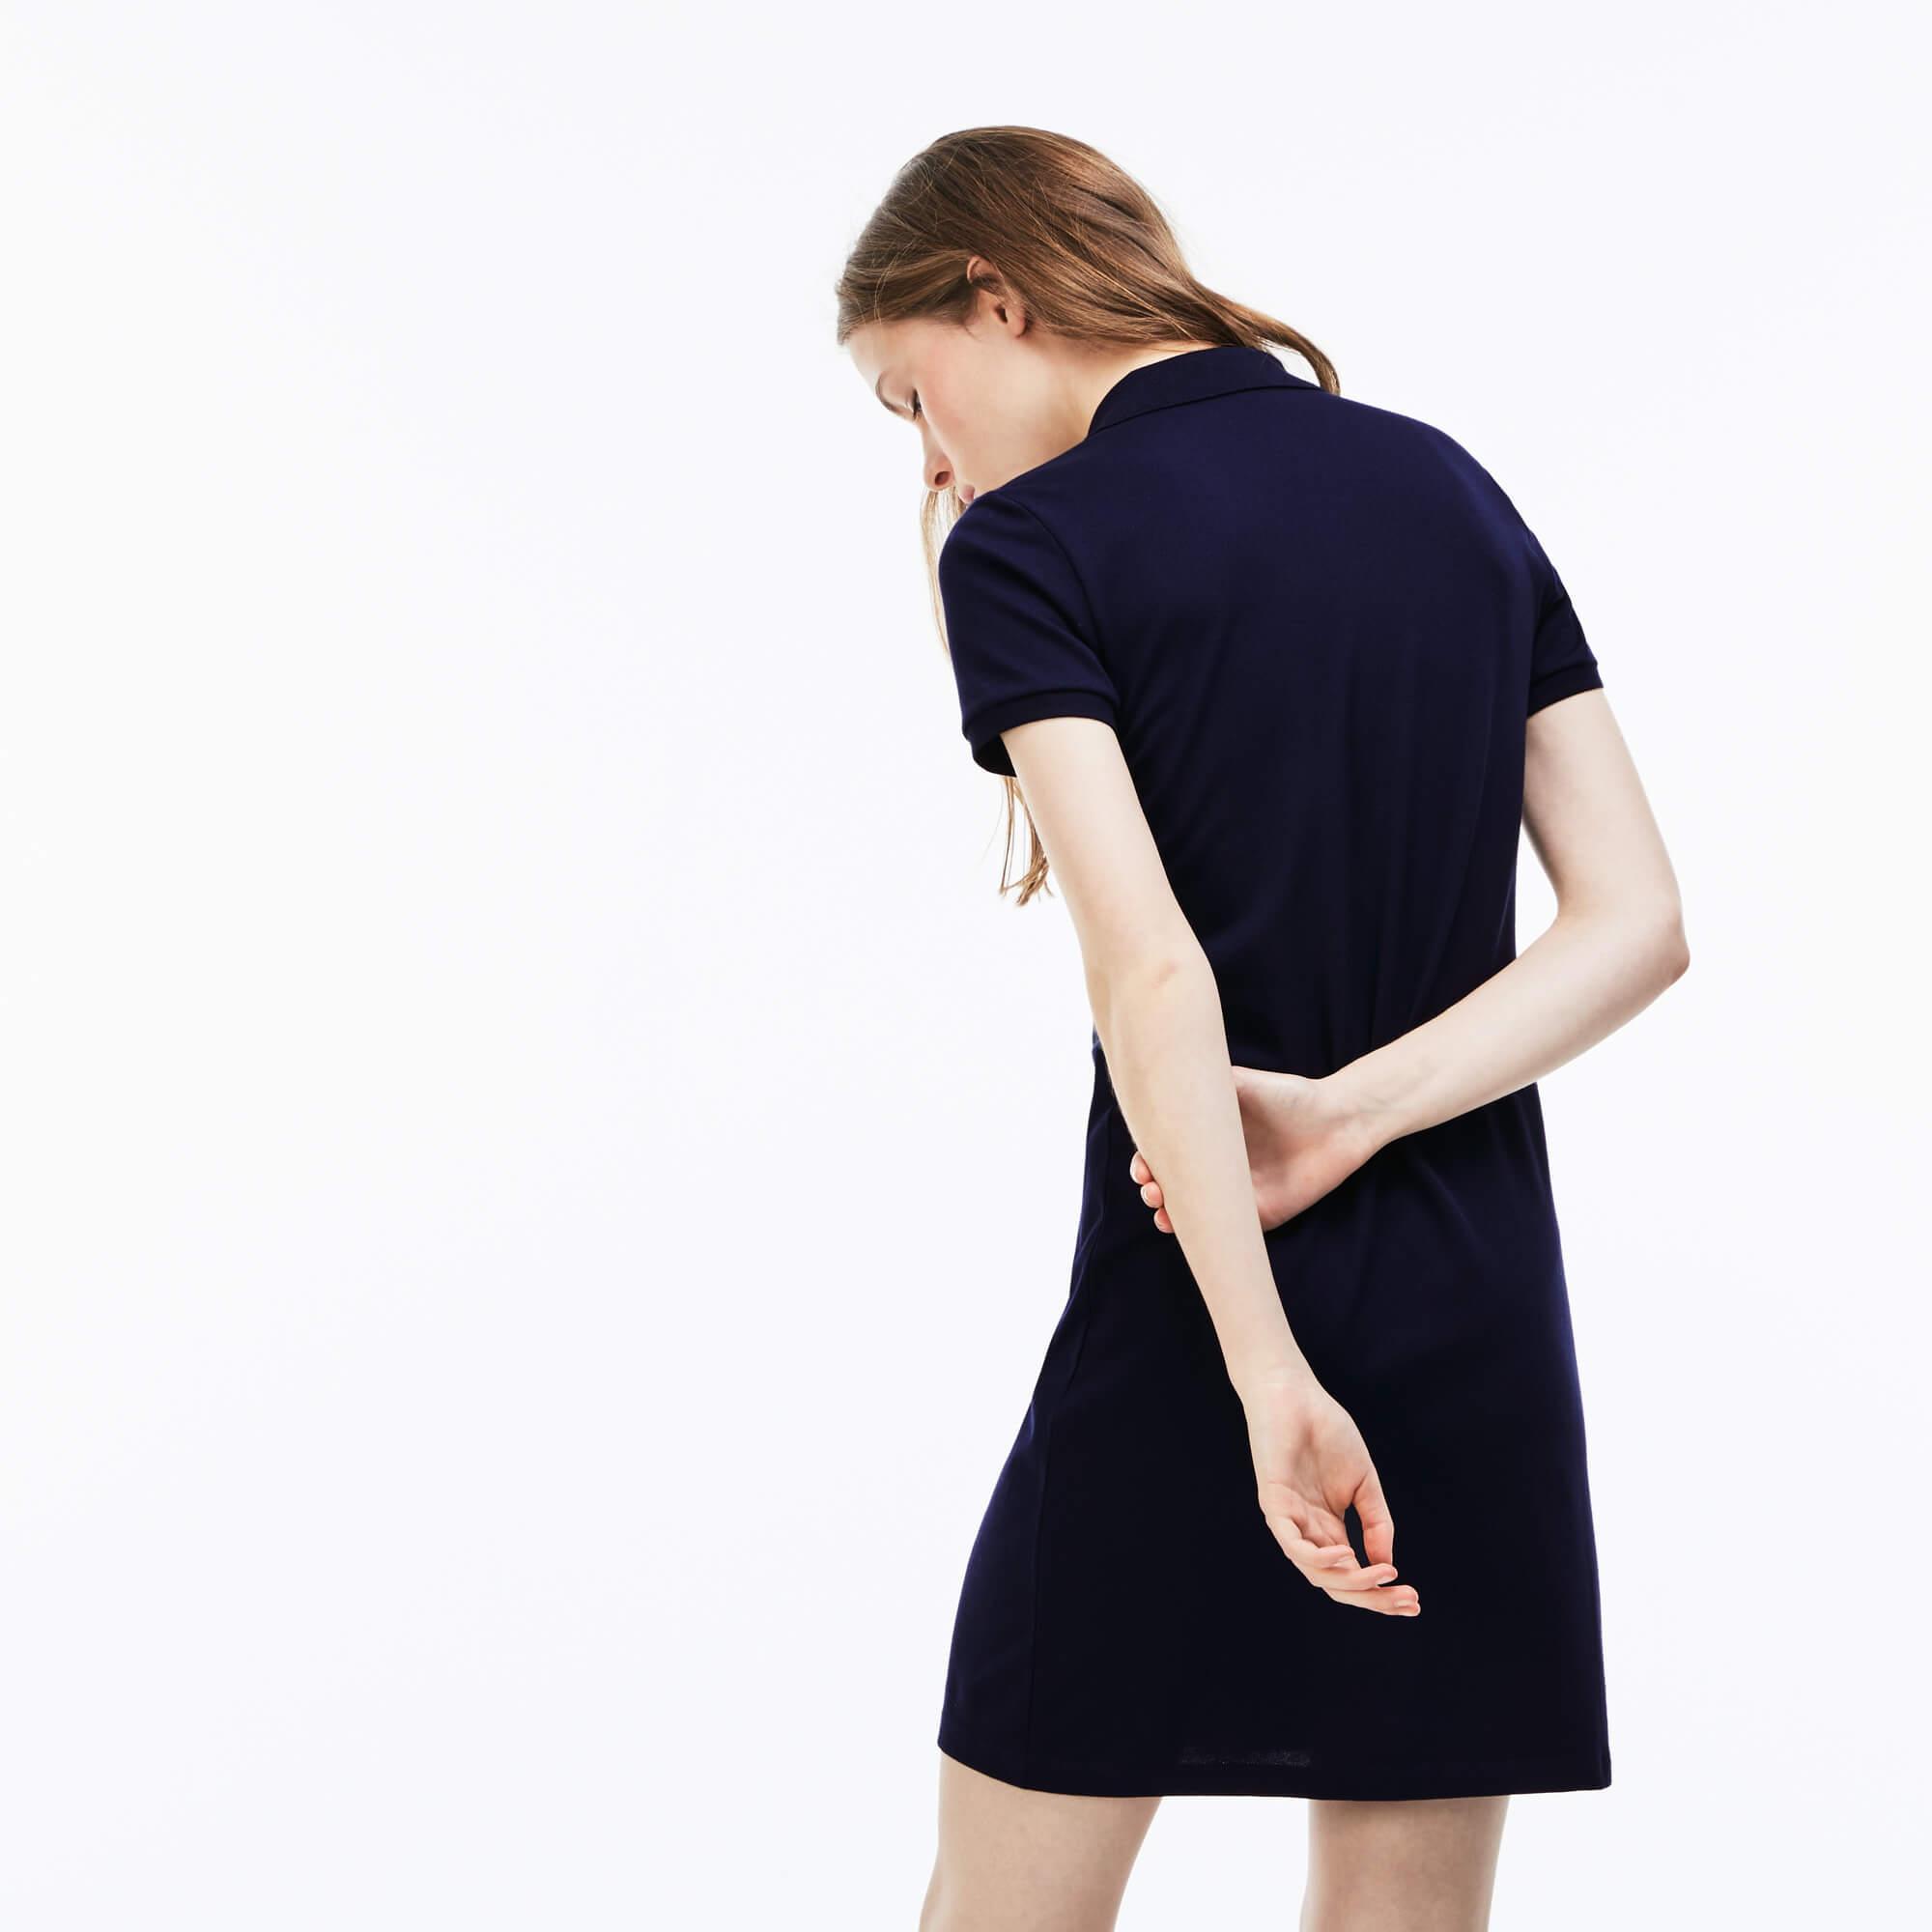 Lacoste Kadın Slim Fit Polo Yaka Lacivert Elbise